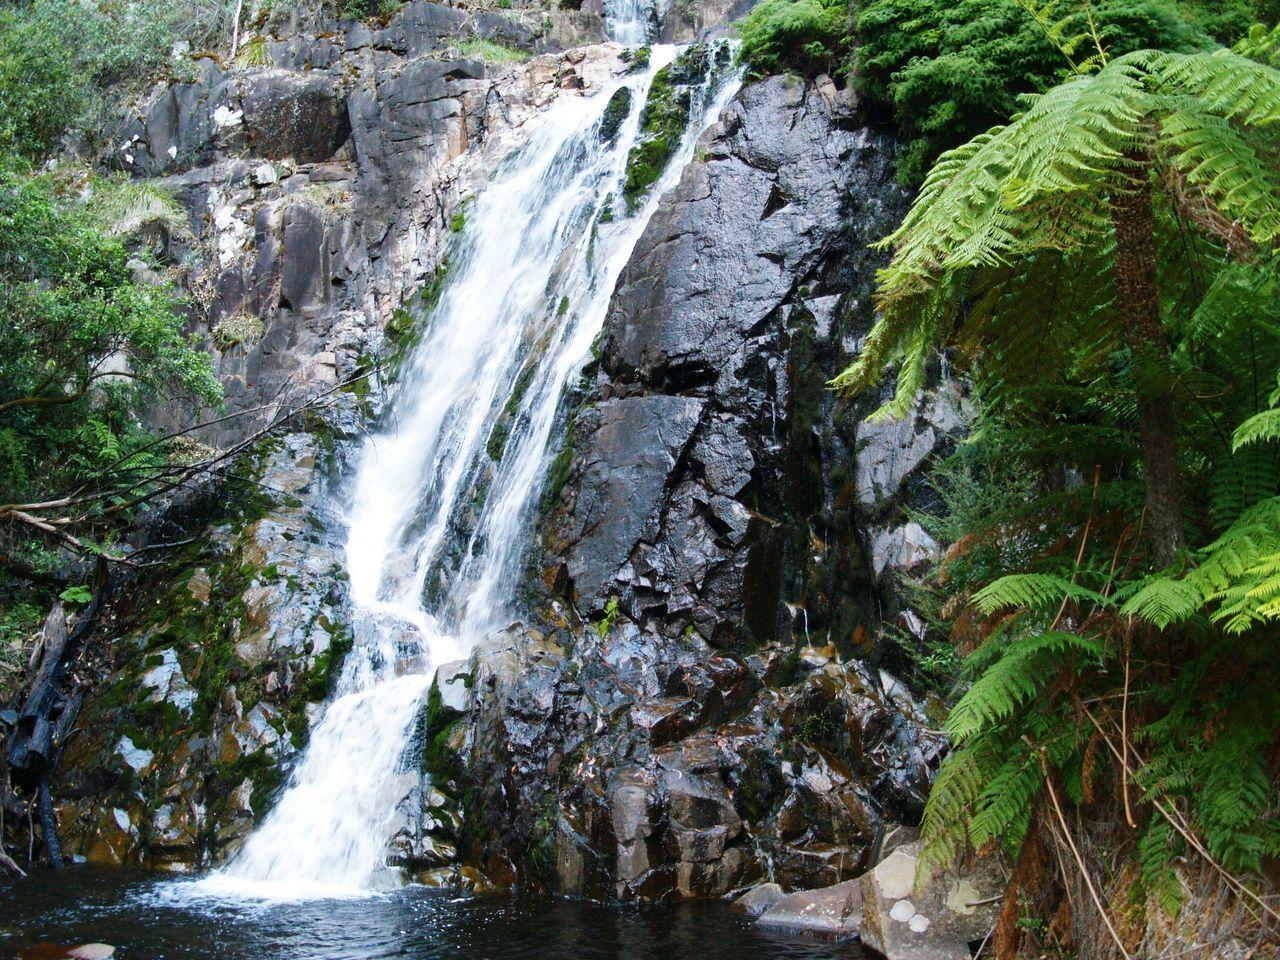 Waterfall Beauty In Nature Motion Splashing Water Day Outdoors Rocks Rocks And Water Landscape Waterfalls💦 Australian Bush Outside Photography Nature